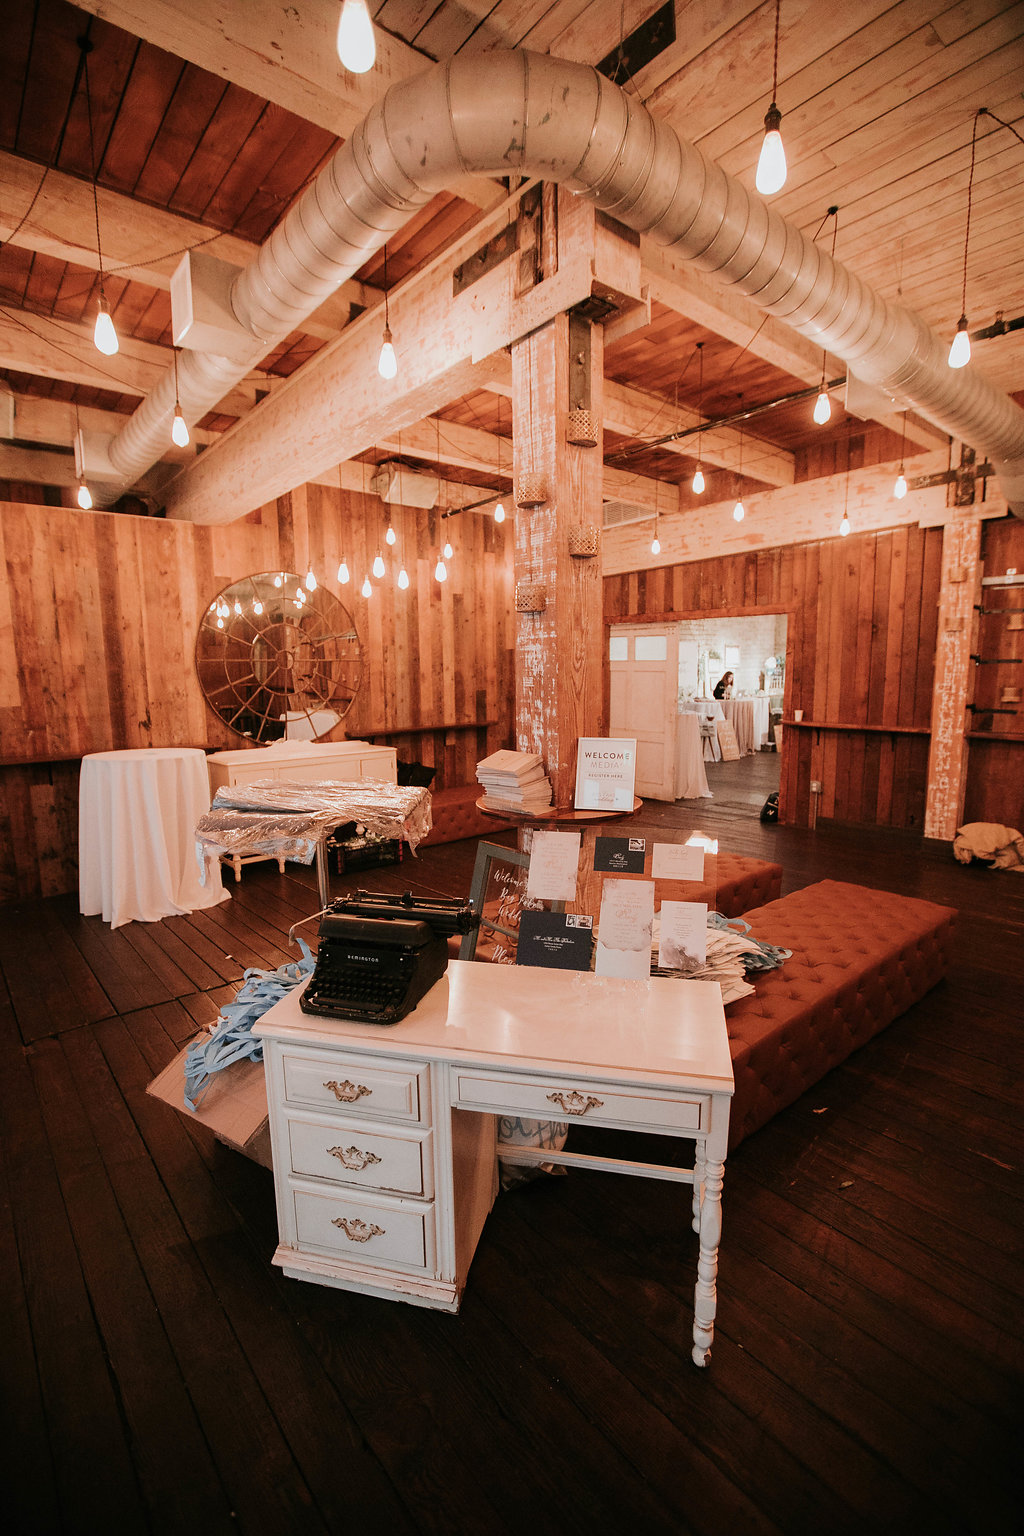 The_Big_Fake_wedding_Seattle_Within_sodo_wedding_by_Adina_Preston_Weddings_245.JPG